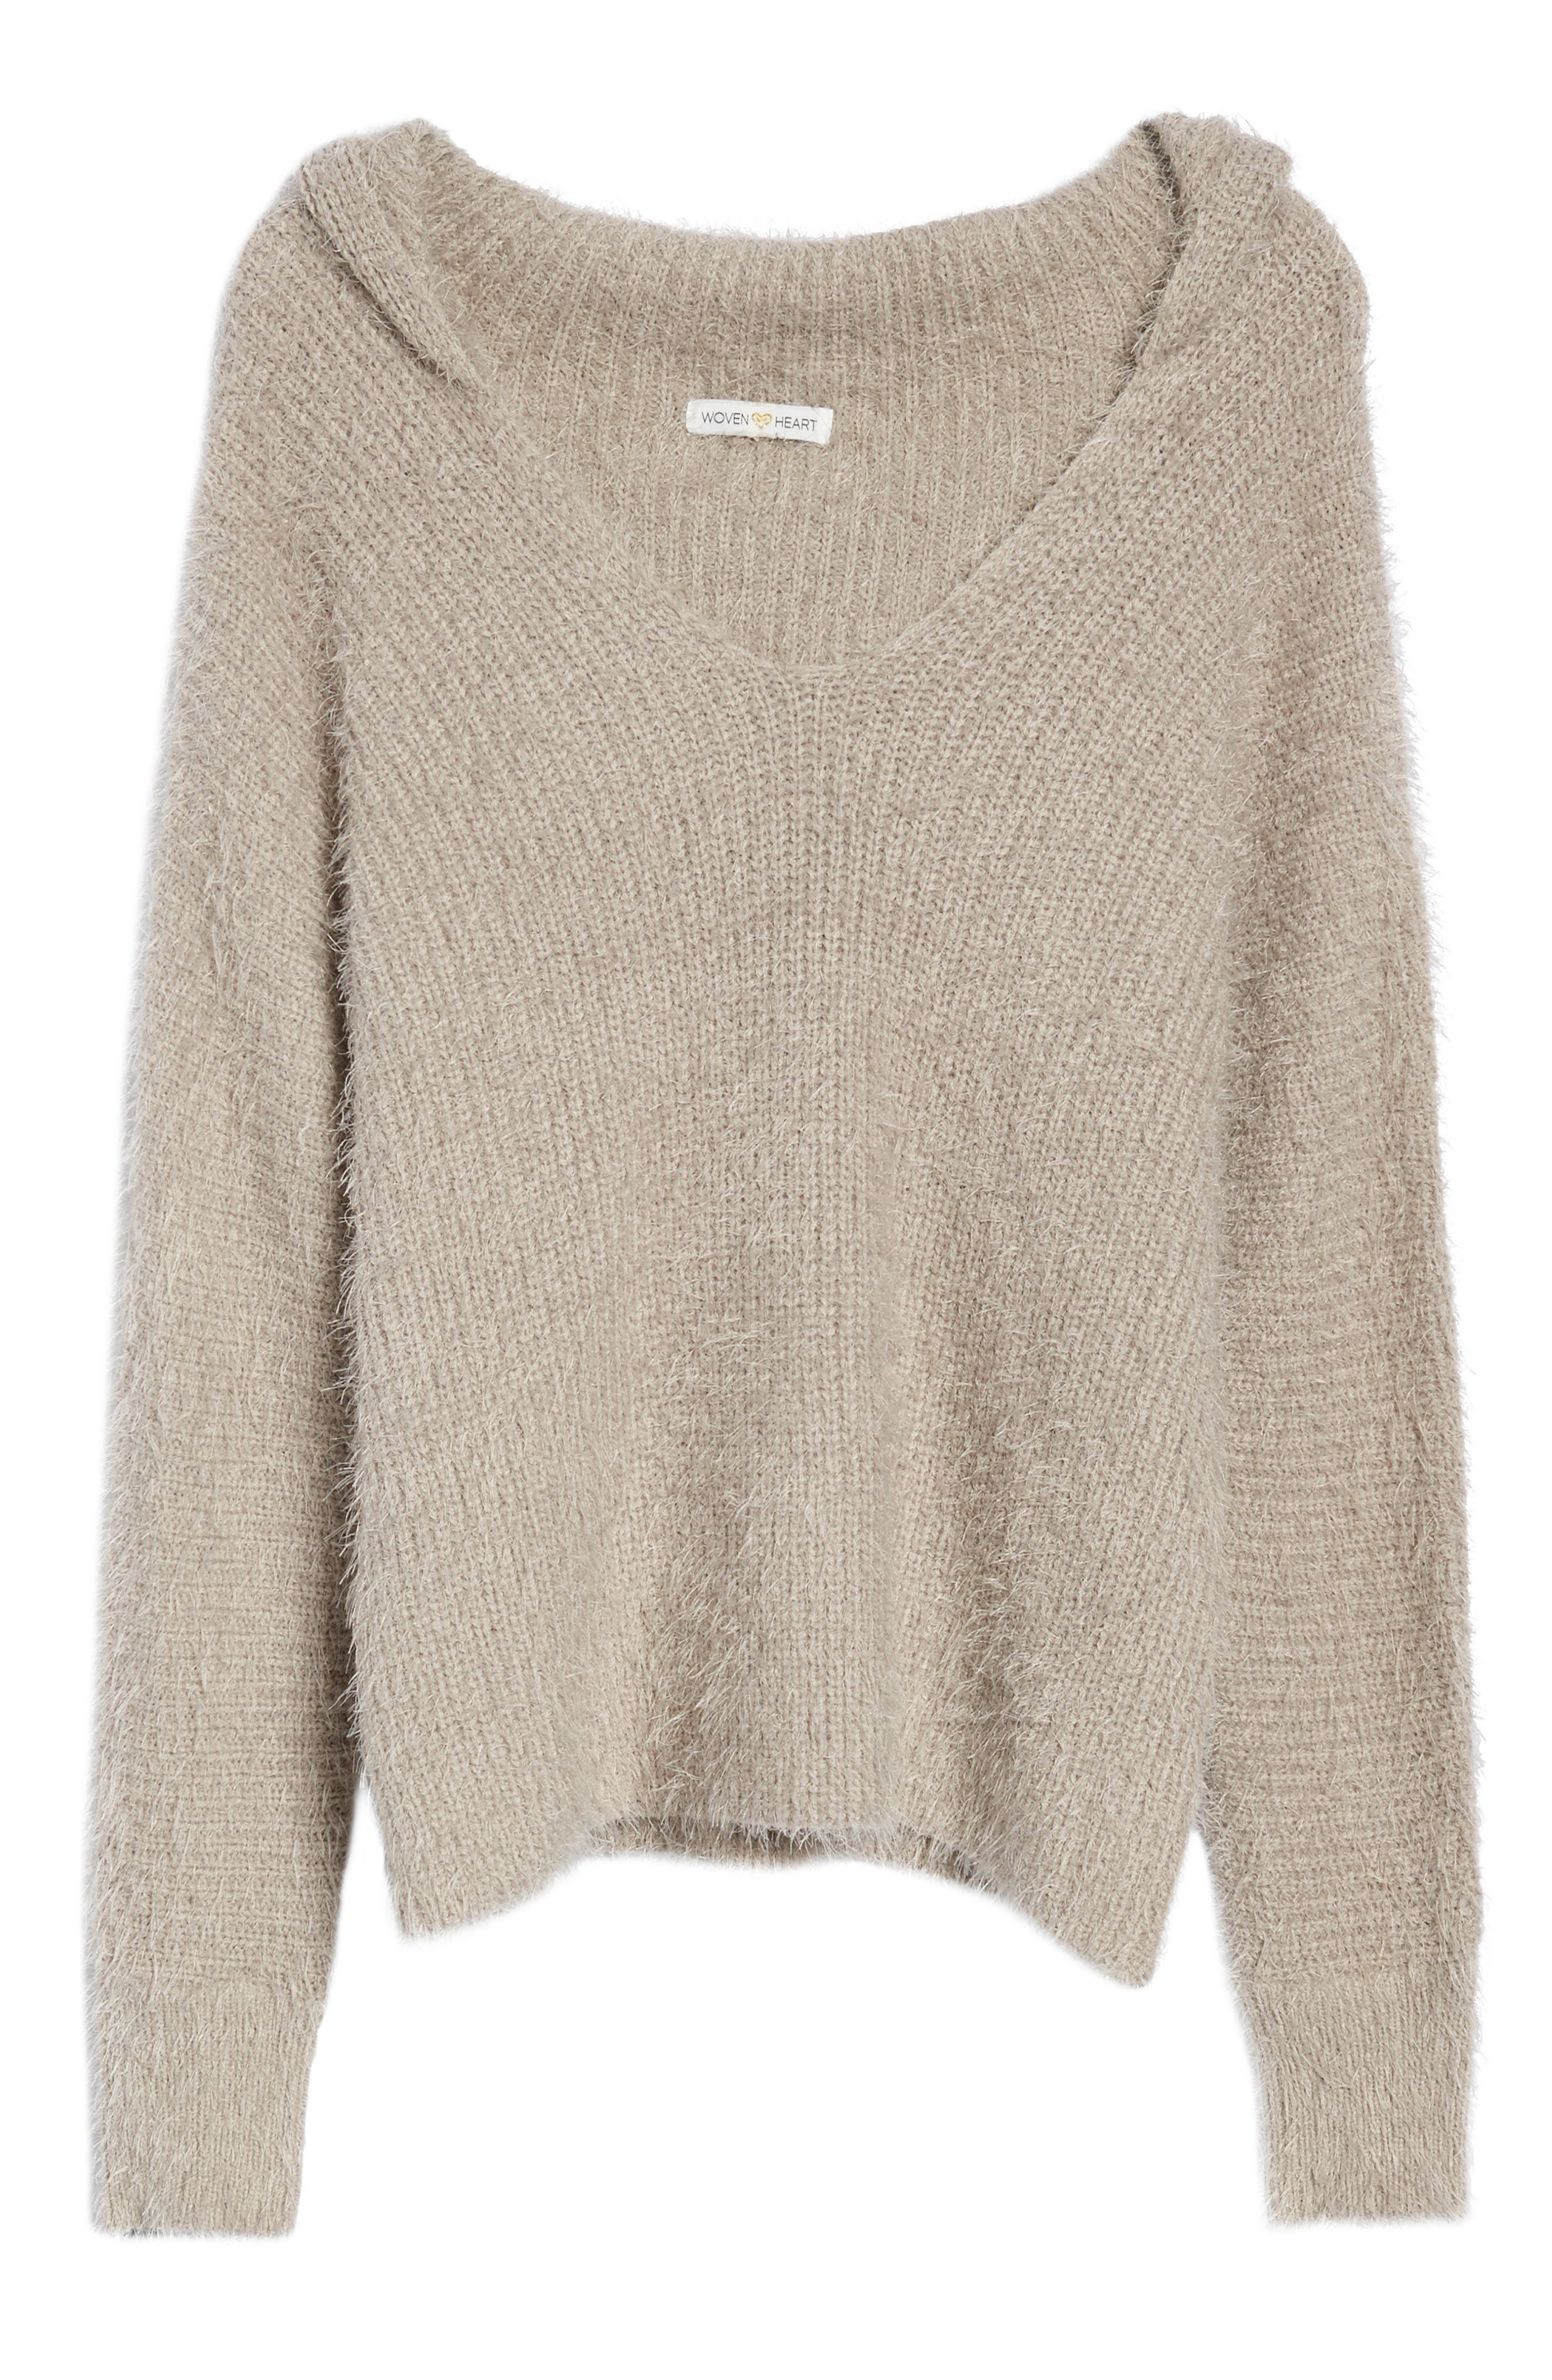 Eyelash Knit Hooded Sweater,                             Alternate thumbnail 6, color,                             260